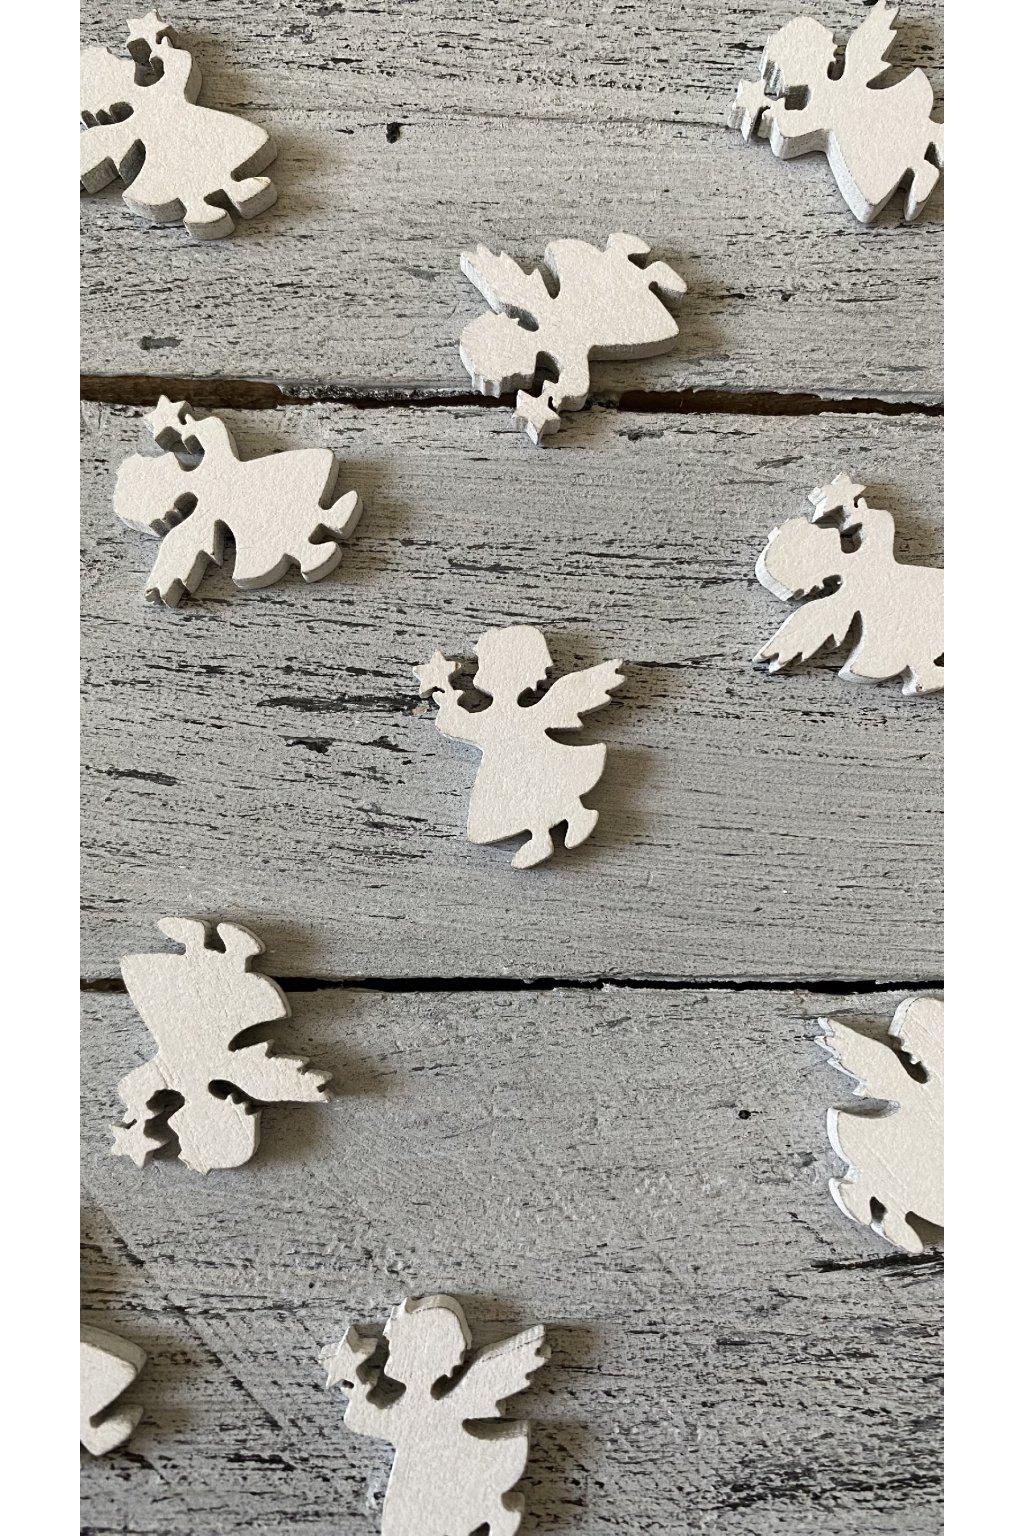 Bílý dřevěný andílek.  Rozměr 3 x 2,5 cm